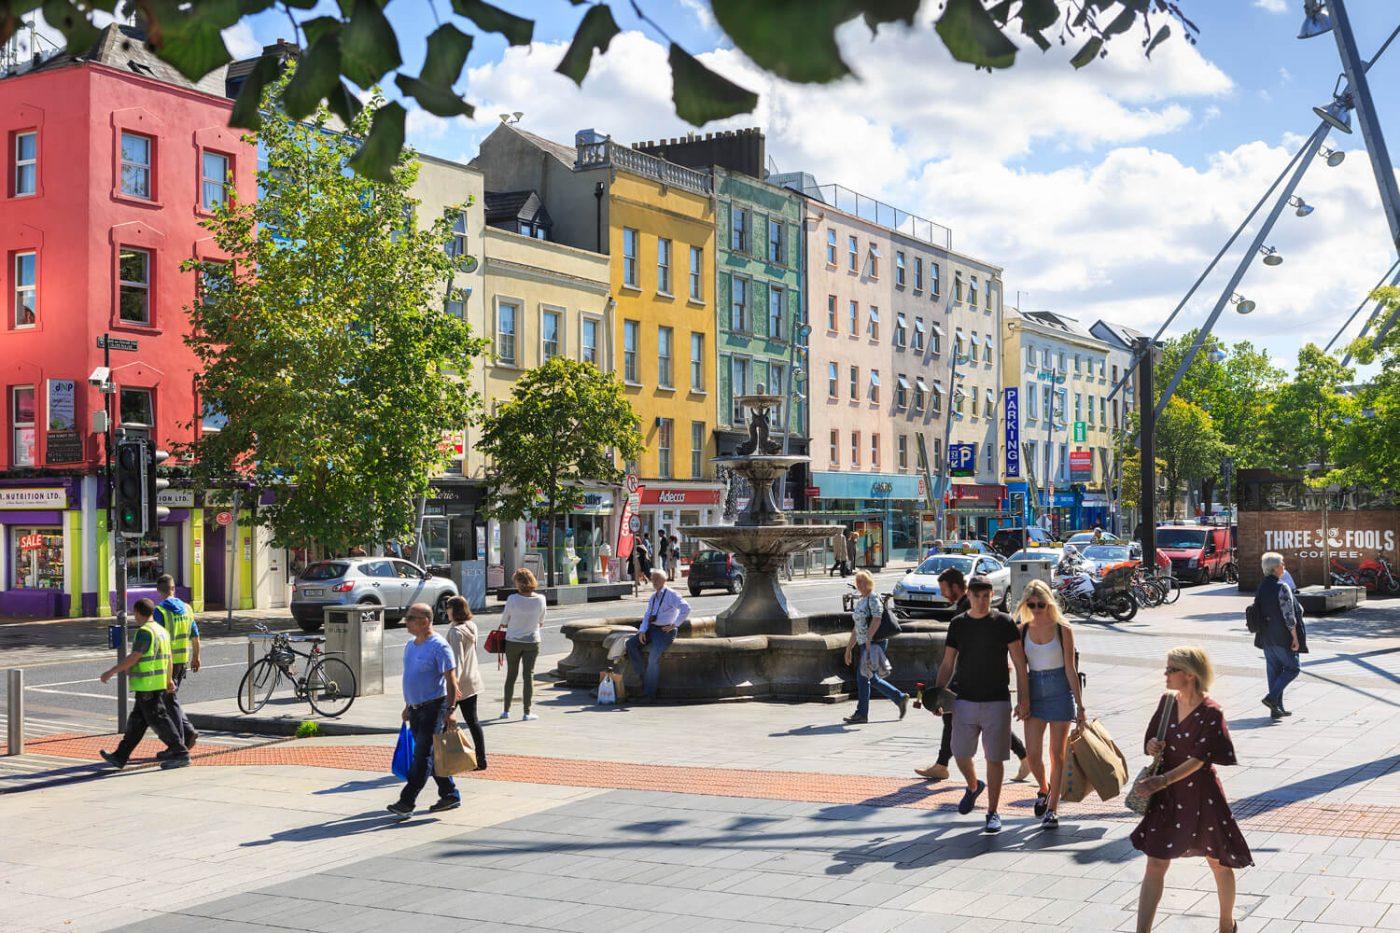 Jim McCarthy Photographer Cork - Photography Prints - Berwick Fountain on The Grand Parade Cork #5120